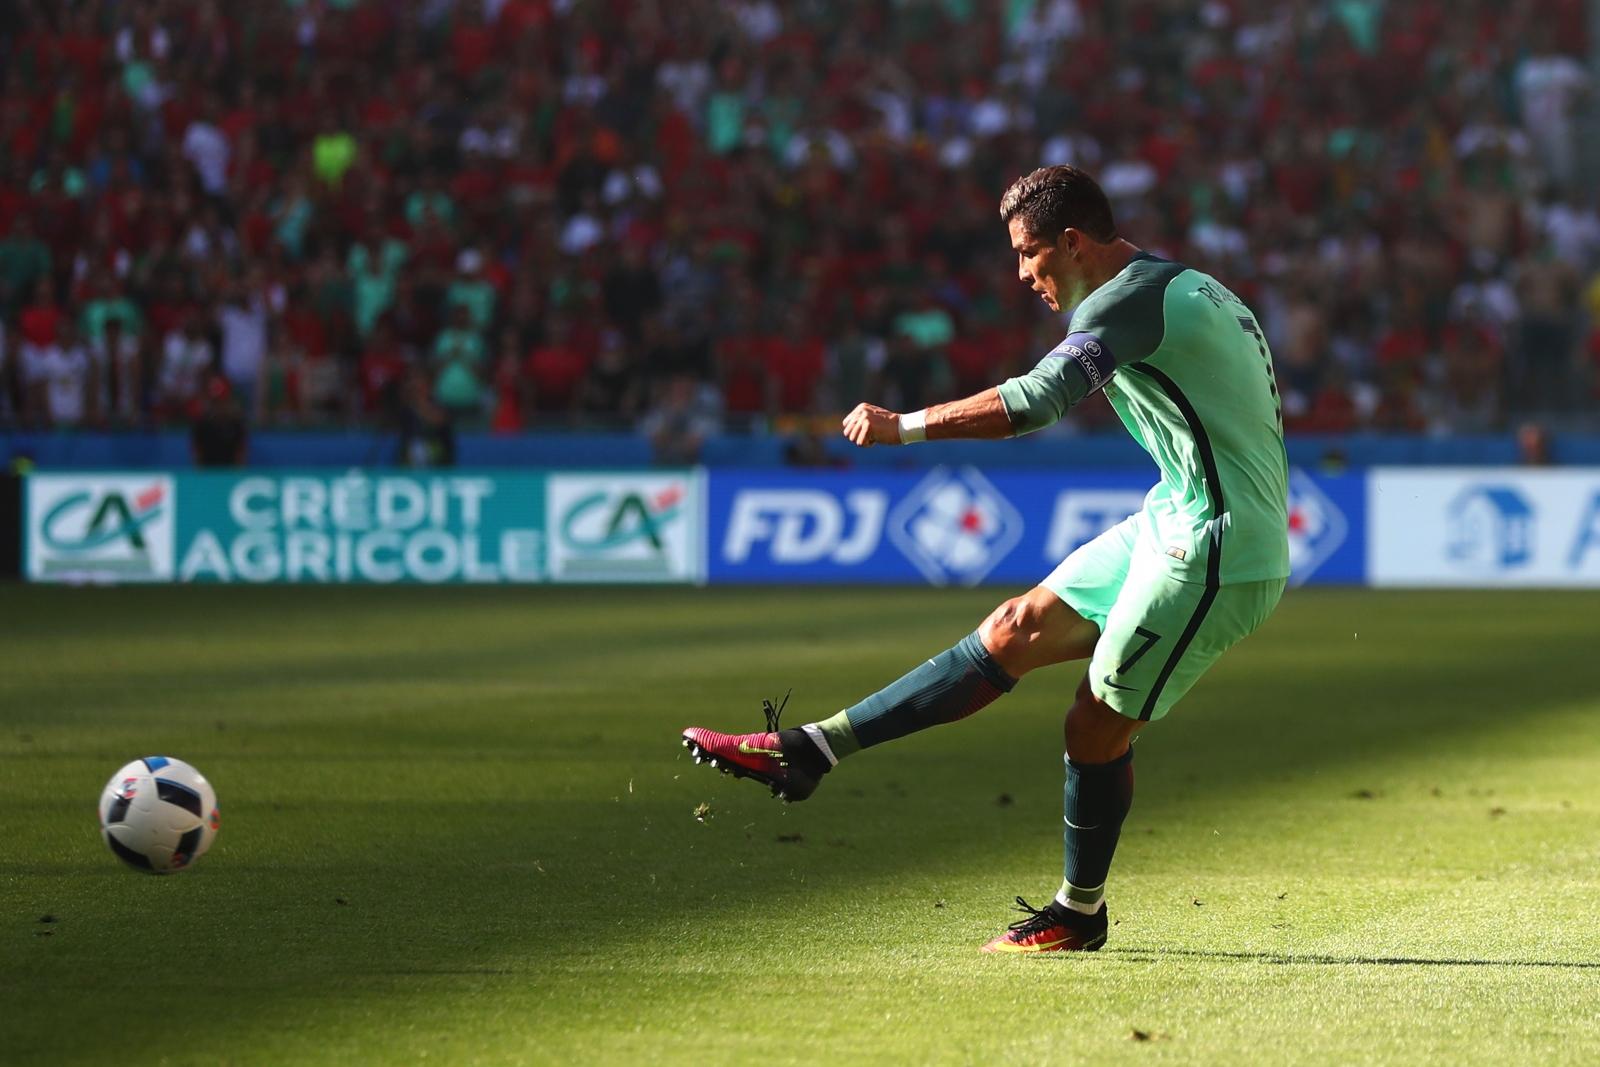 Cristiano Ronaldo hits a shot